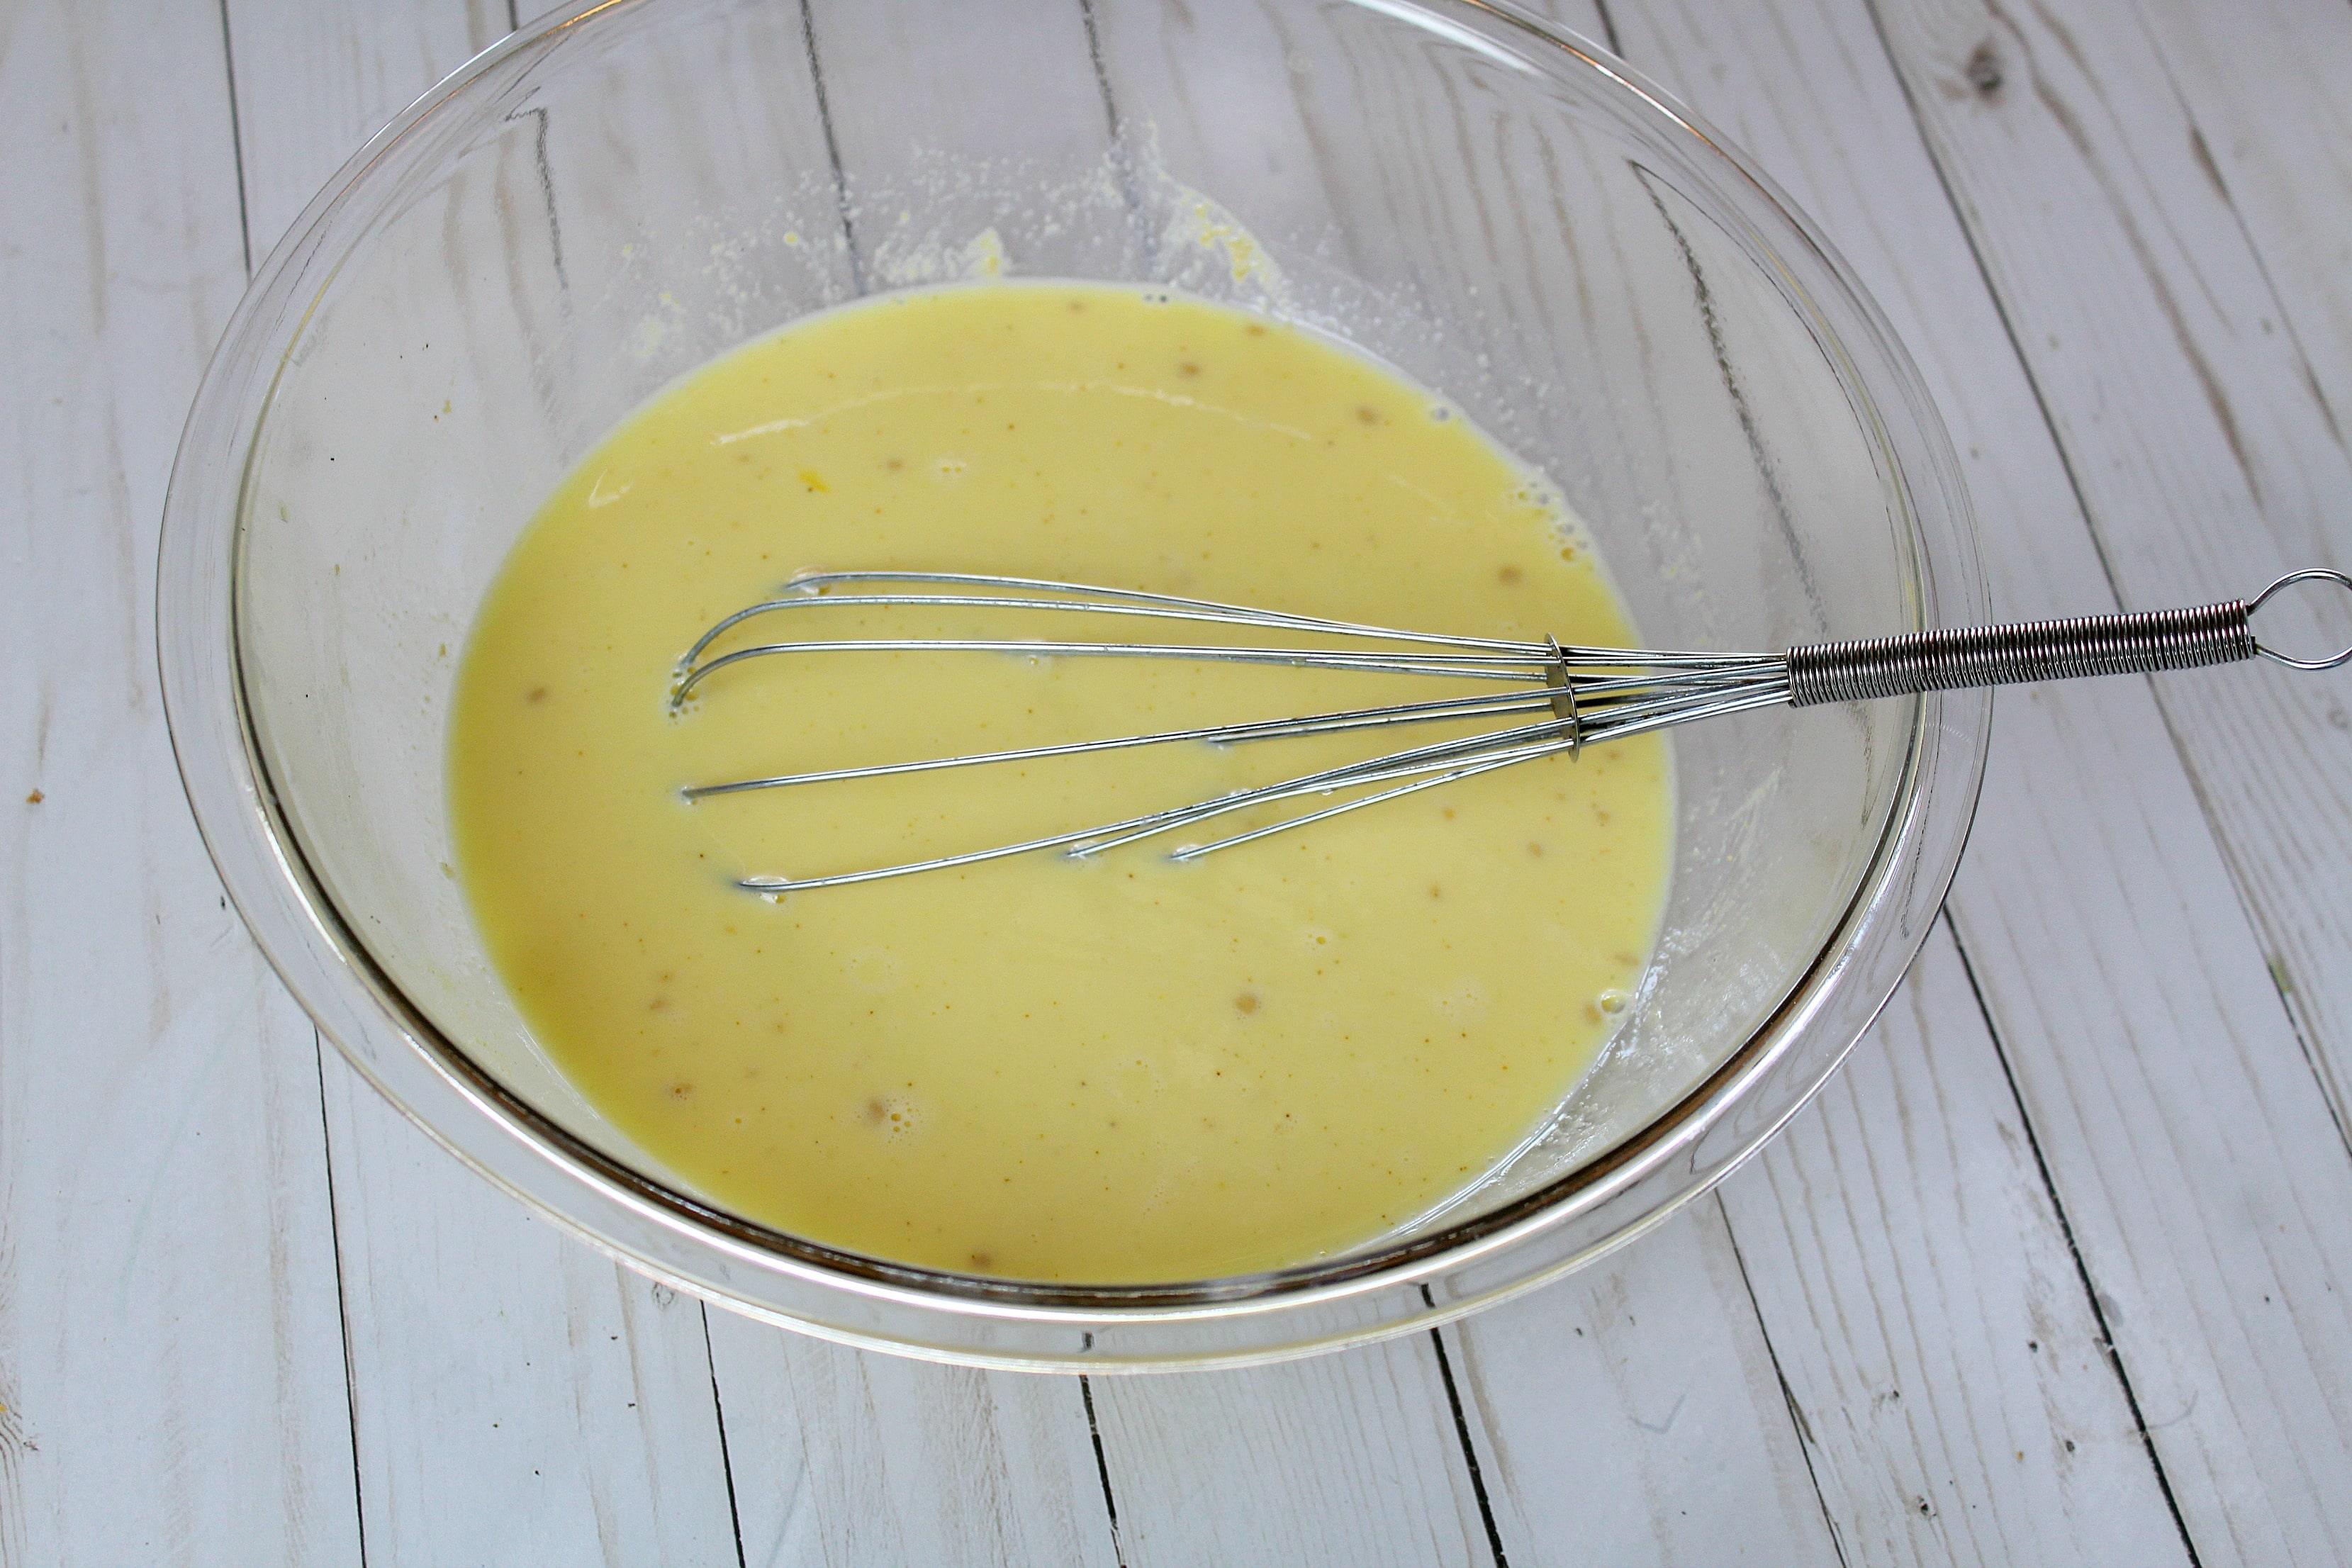 Easy Breakfast Casserole Recipes | Healthy Breakfast | Breakfast Meal Ideas | Complete Meal Casserole Recipe | Food Made Simple